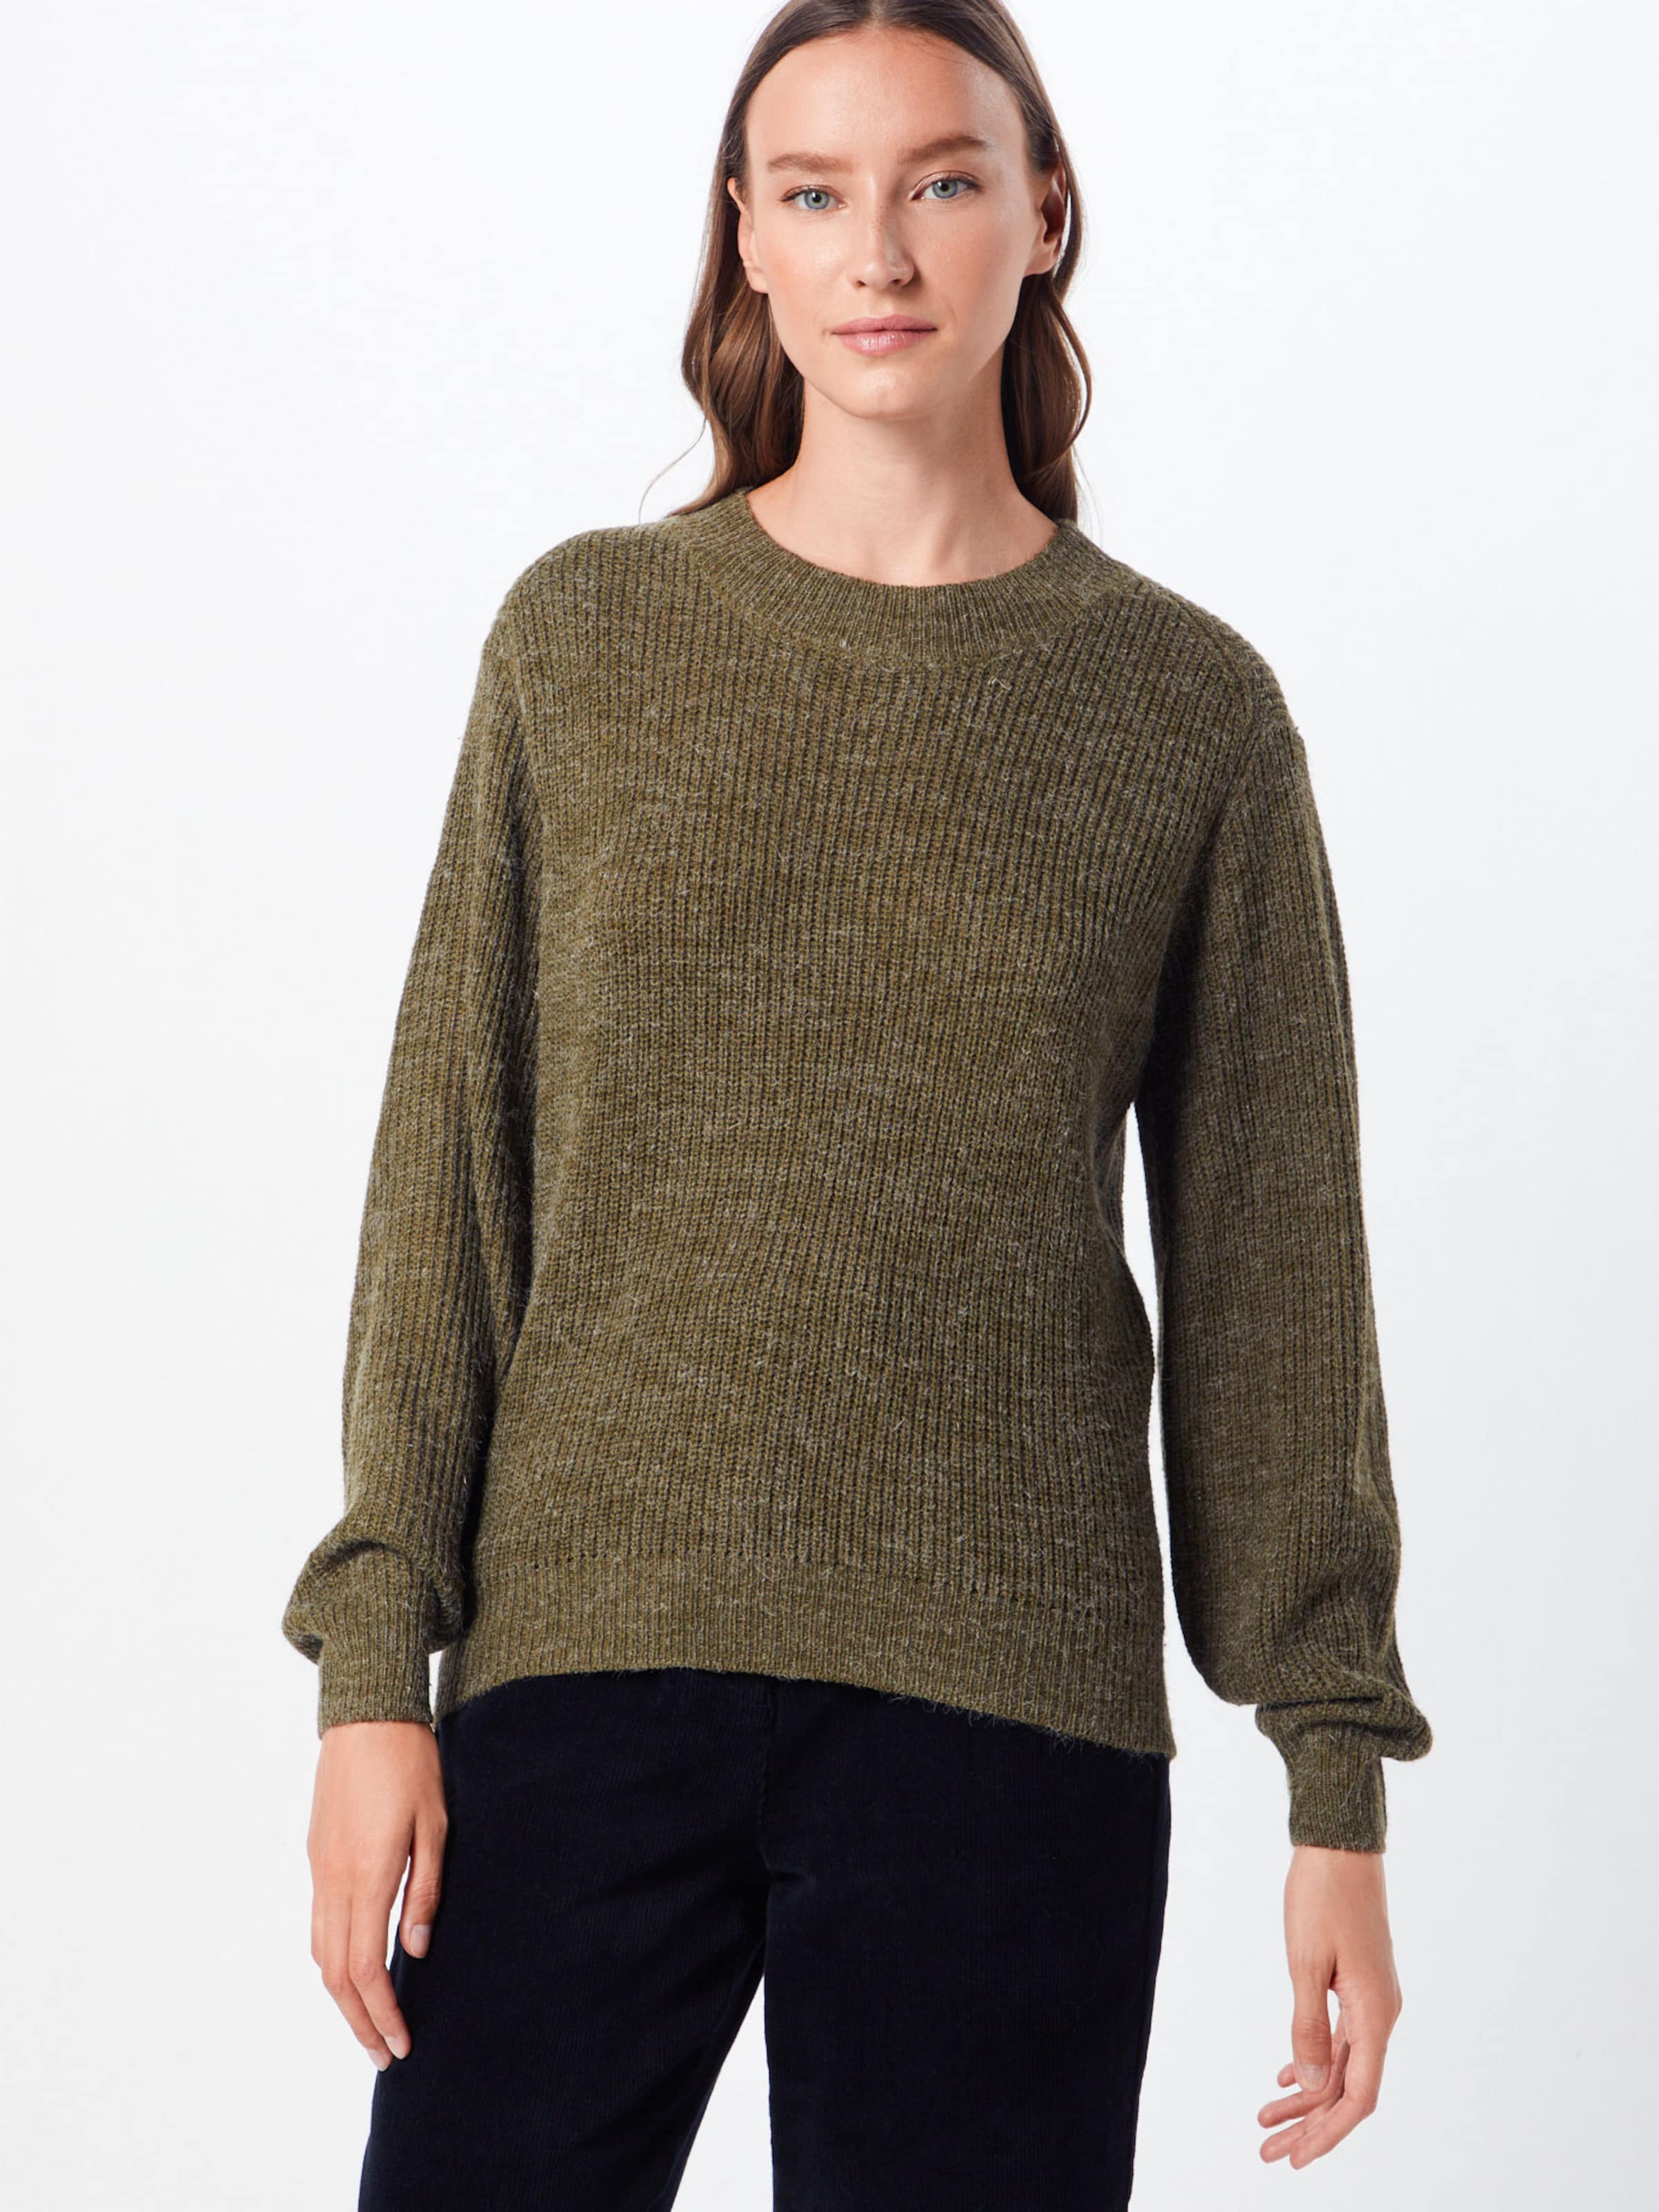 Ichi Pullover Ichi In Oliv Ichi 'novo' In Oliv Pullover 'novo' Pullover n0OPNkX8w